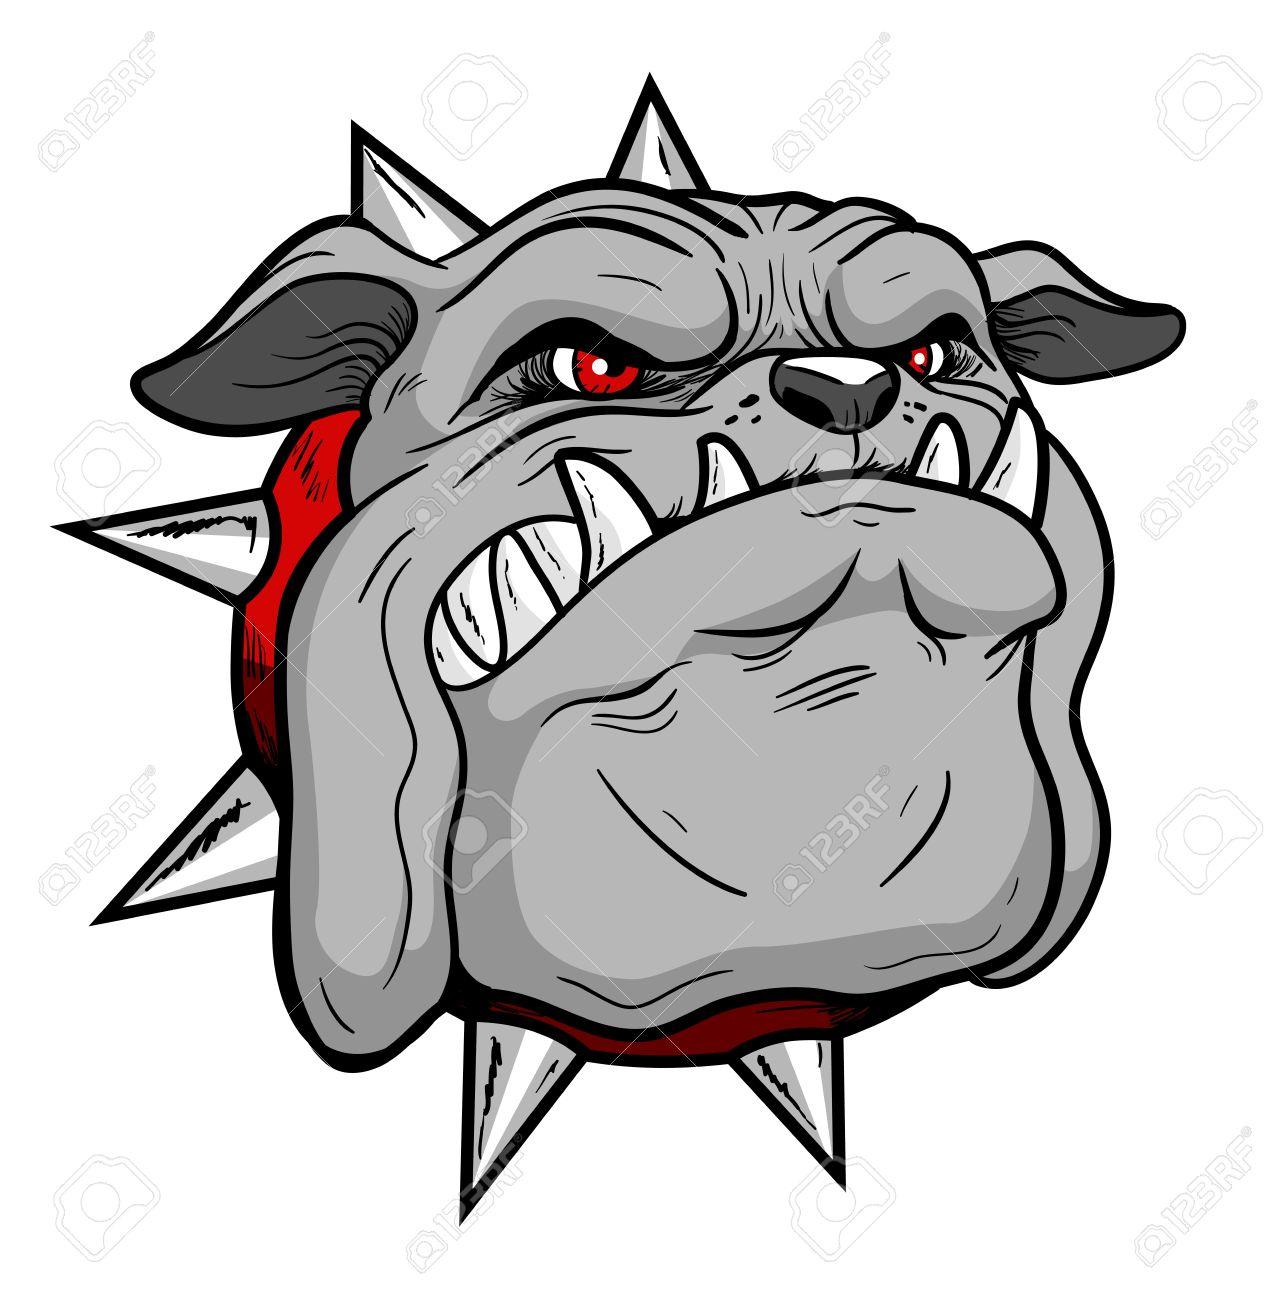 6 best bulldog tattoo designs rh askideas com bulldog tribal tattoo designs marine bulldog tattoo designs